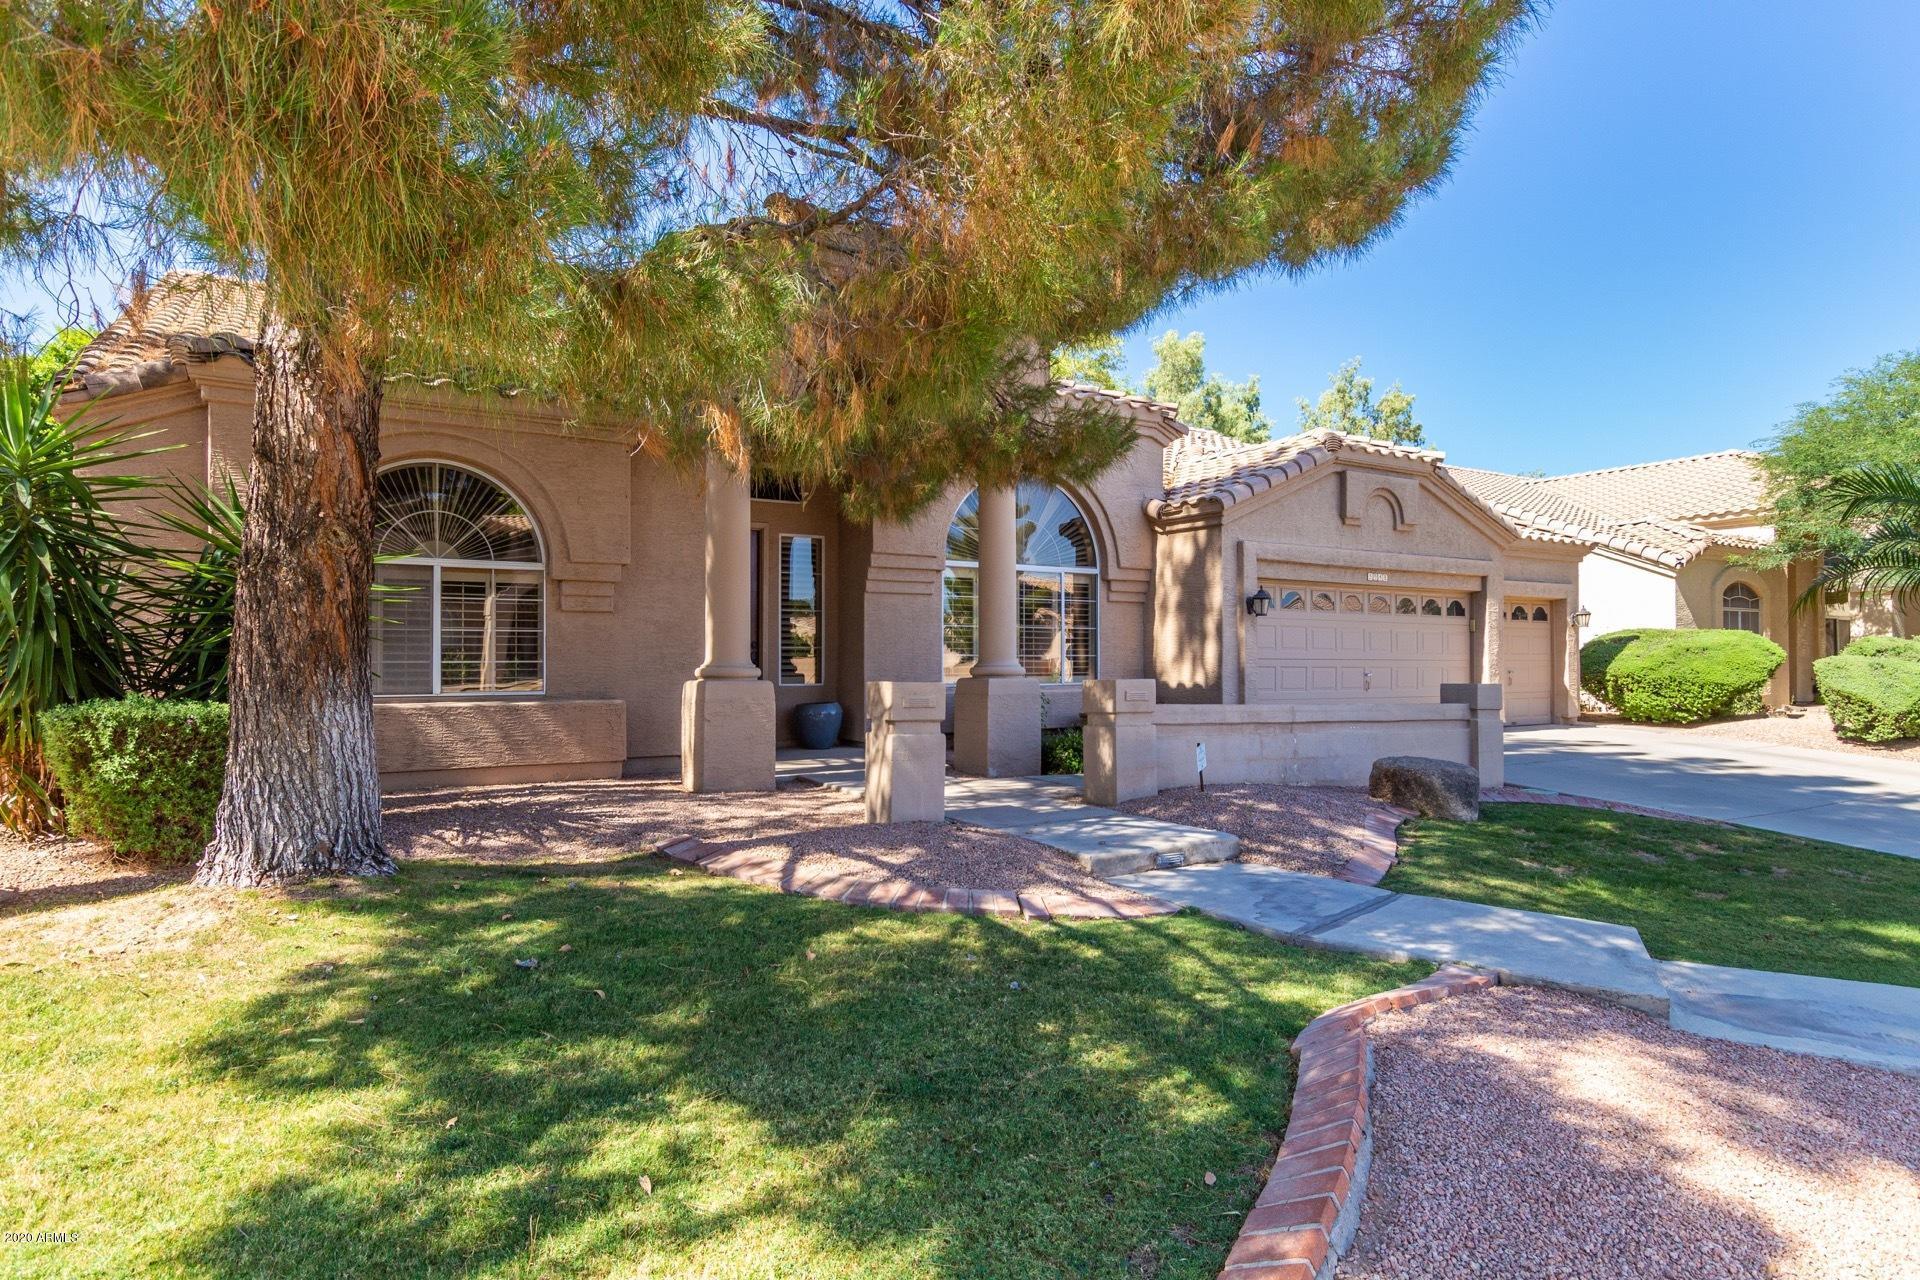 Photo of 5948 W ORCHID Lane, Chandler, AZ 85226